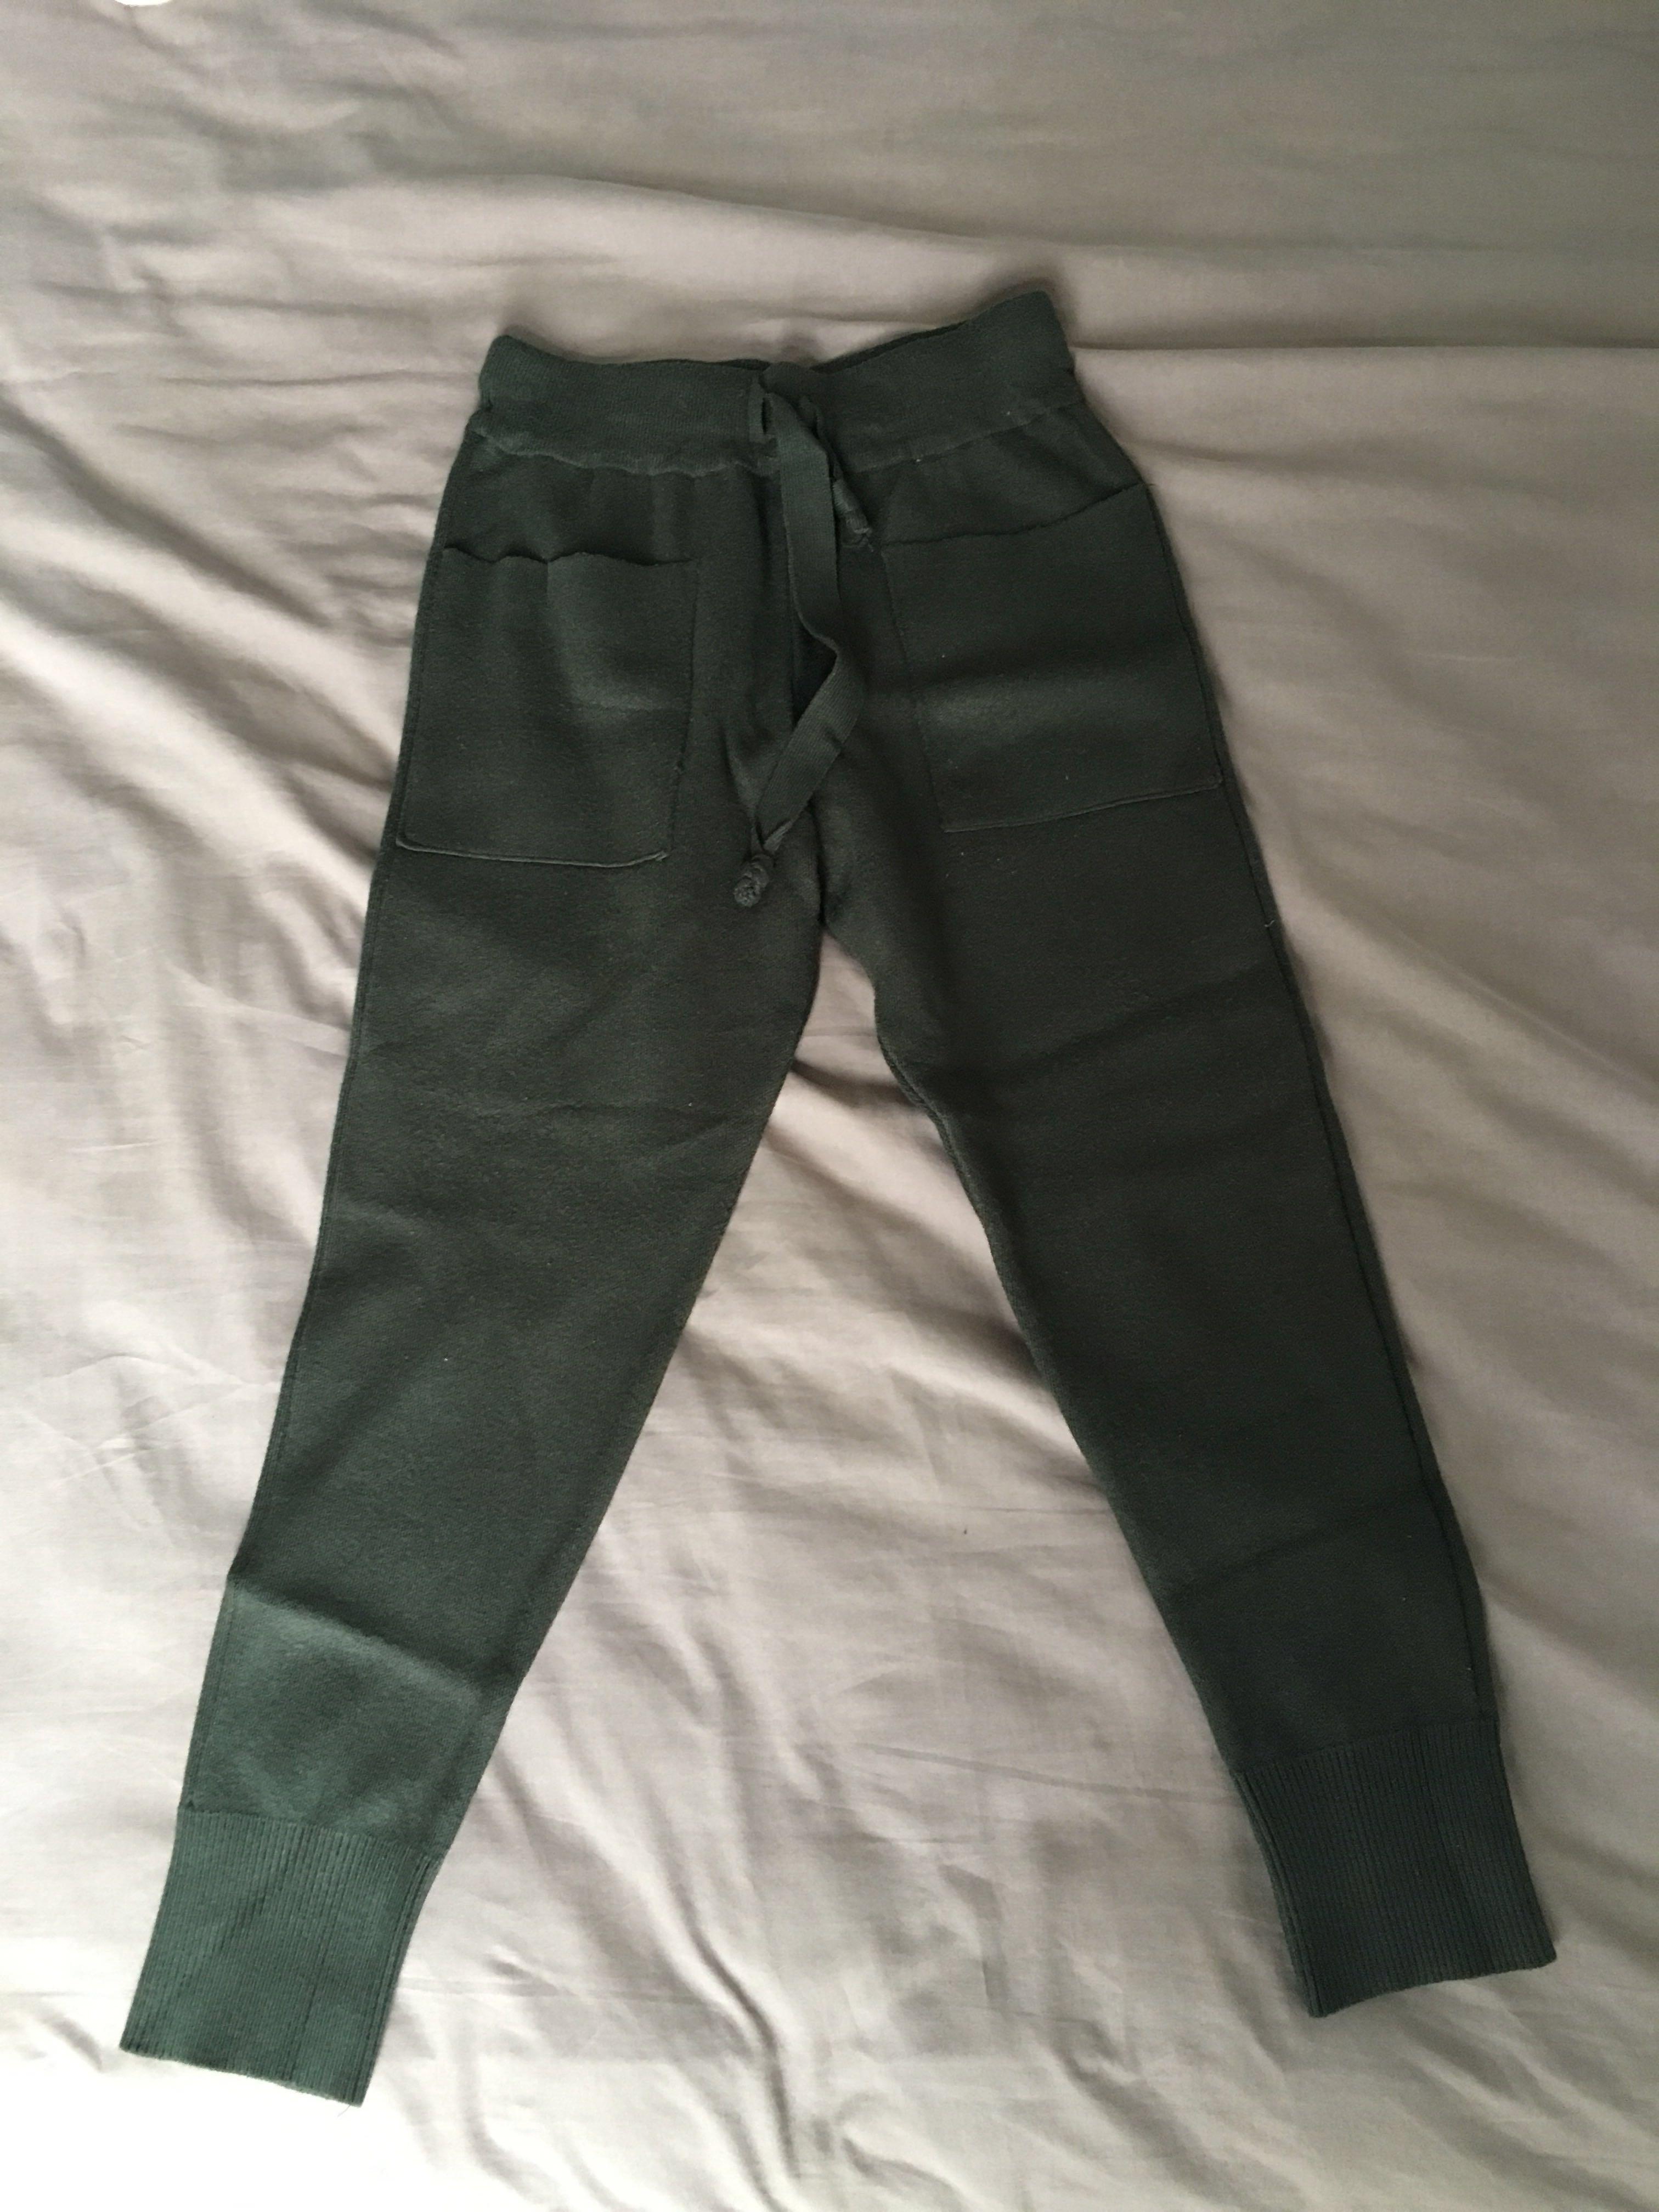 504f2312 Zara knit pants, Women's Fashion, Clothes, Pants, Jeans & Shorts on  Carousell